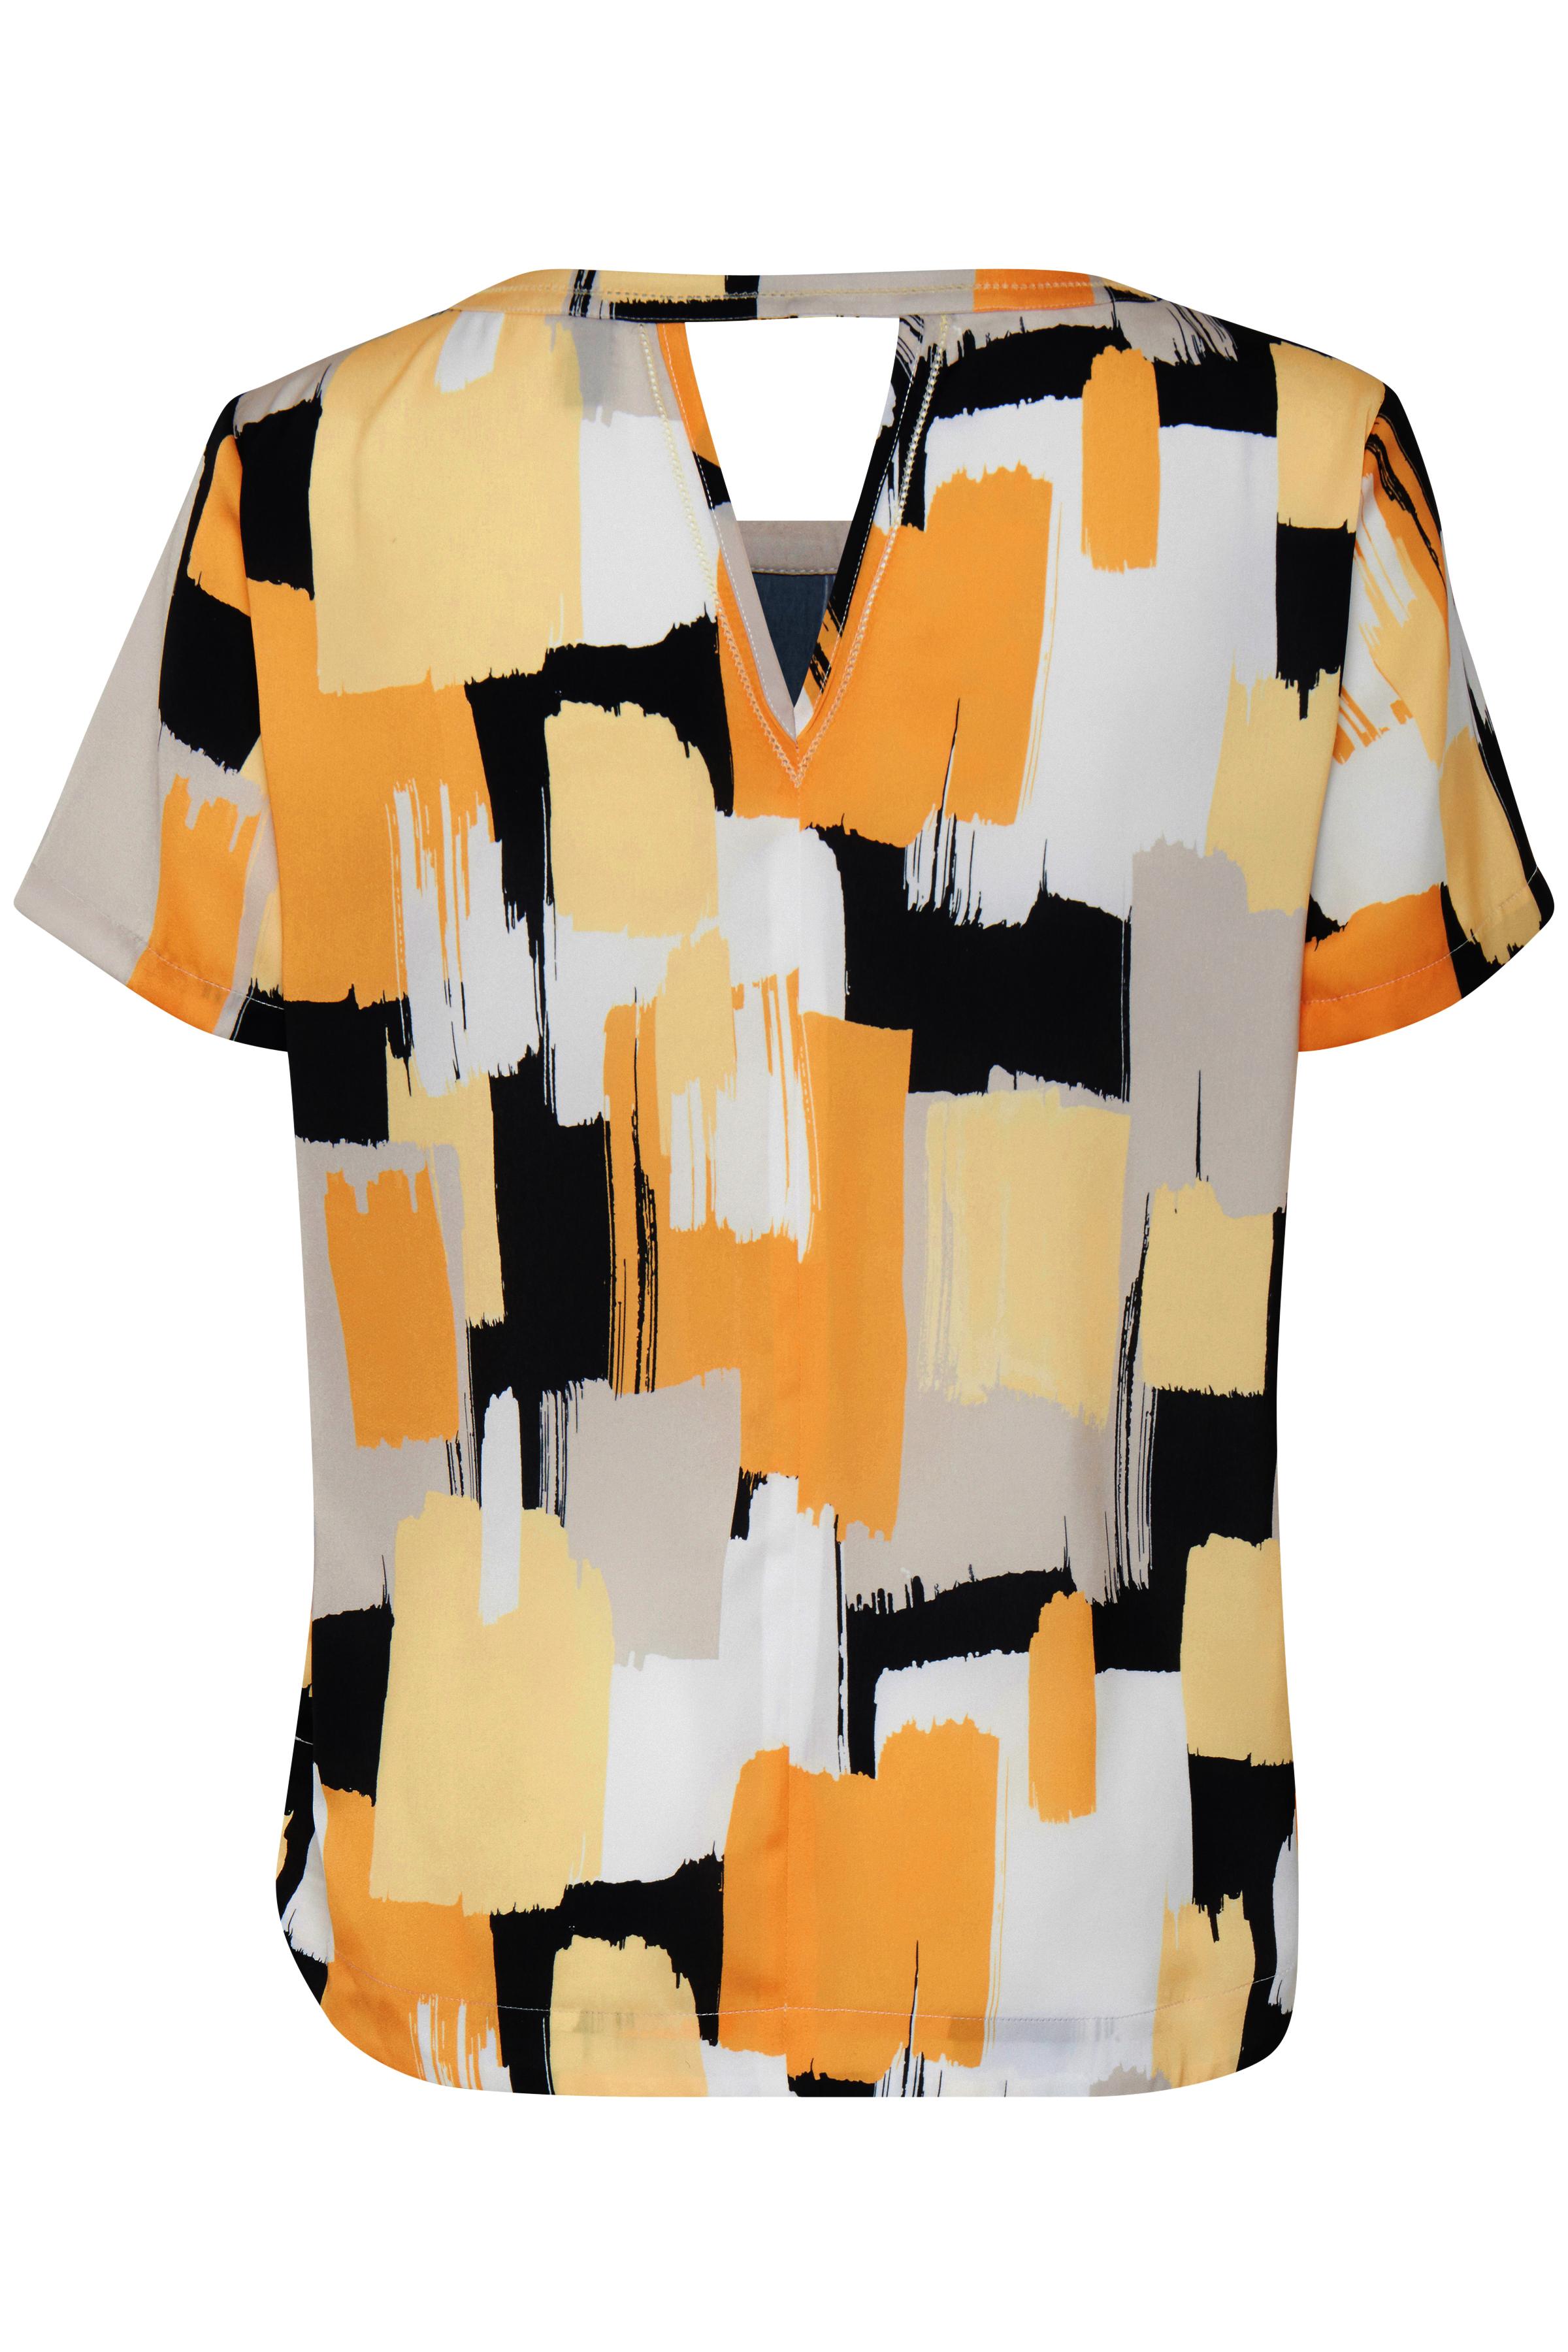 Lysegrå/gul Kortærmet bluse  fra Pulz Jeans – Køb Lysegrå/gul Kortærmet bluse  fra str. XS-XXL her